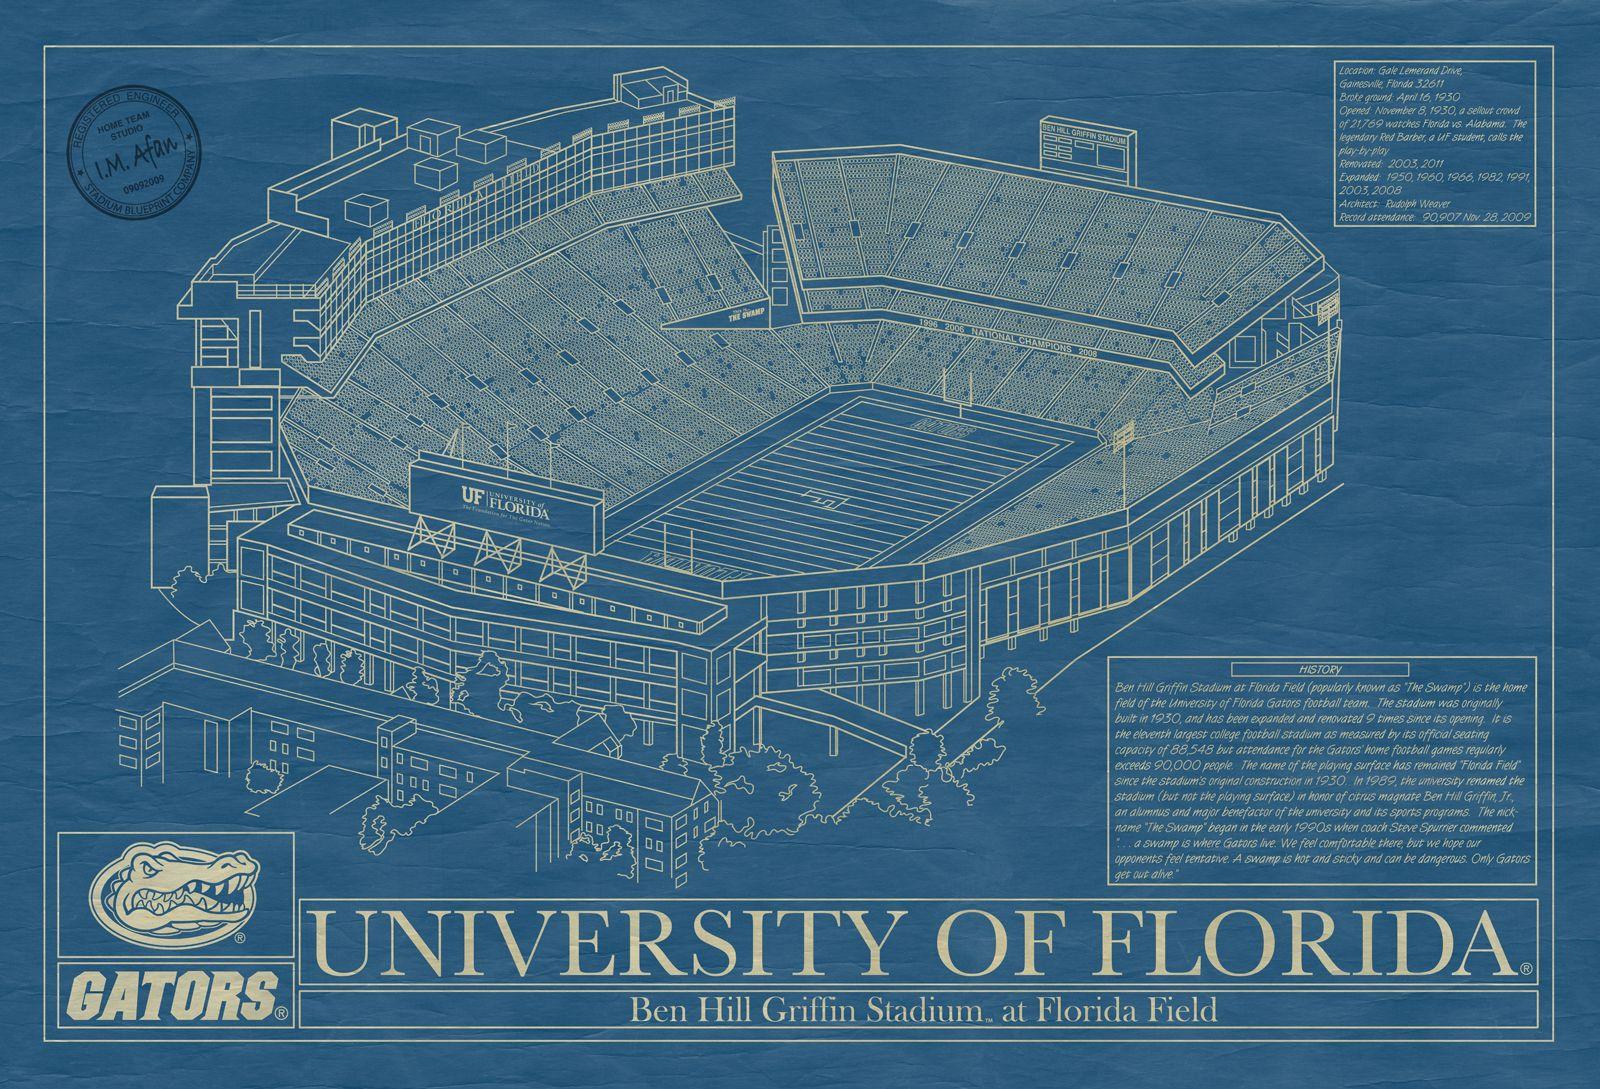 University of florida stadium as a unique blueprint style framed university of florida stadium as a unique blueprint style framed piece of art malvernweather Gallery